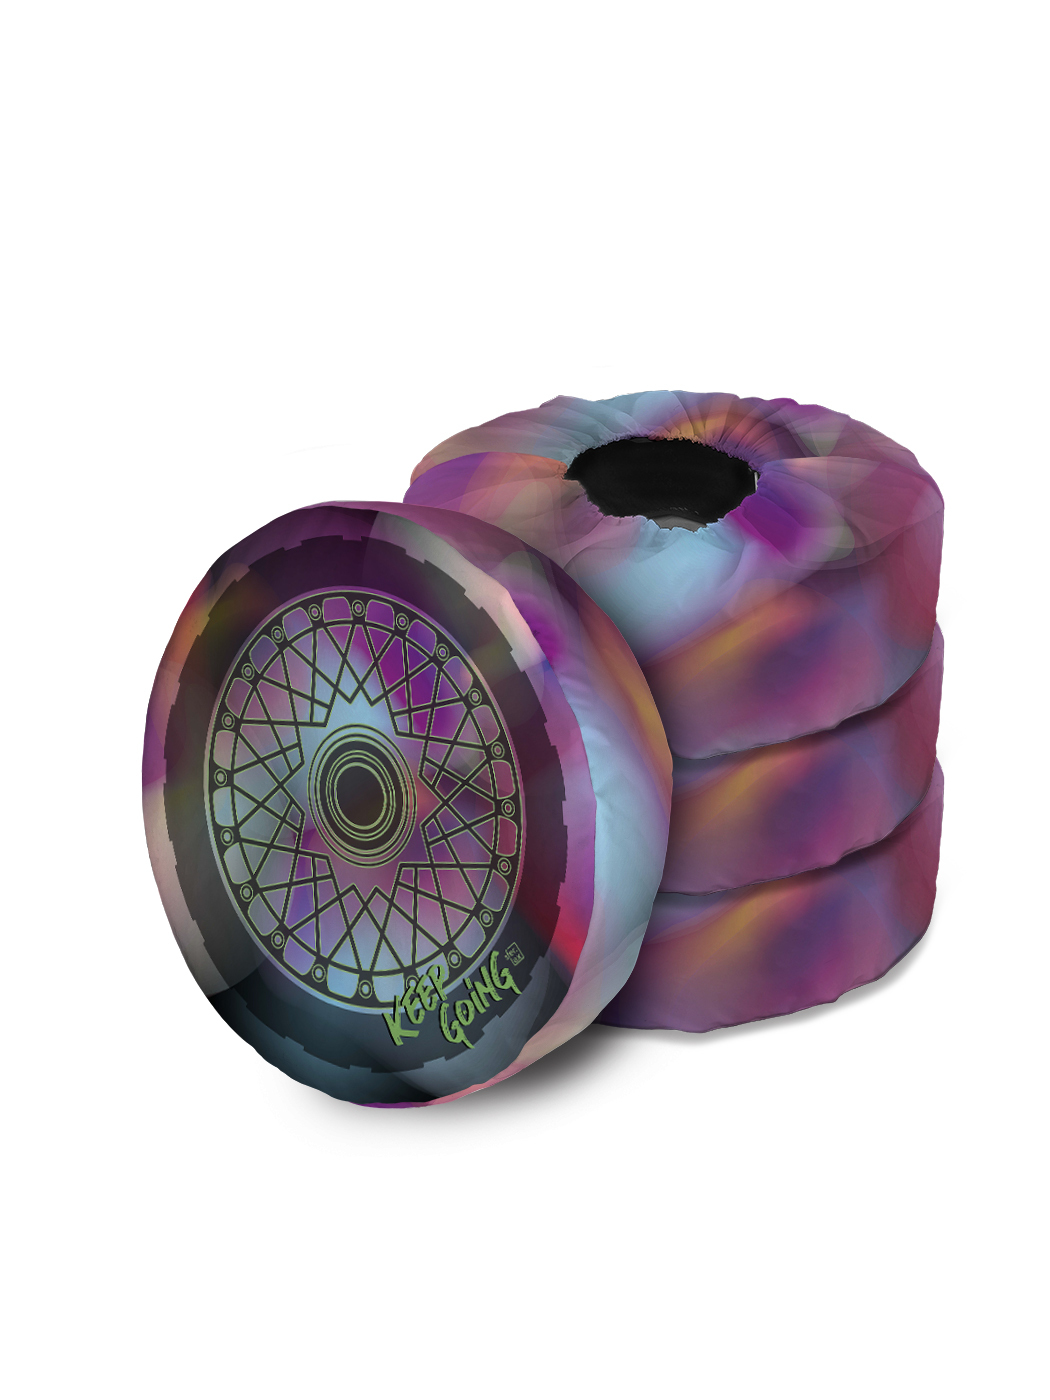 Чехлы для колес автомобиля sfer.tex до 17